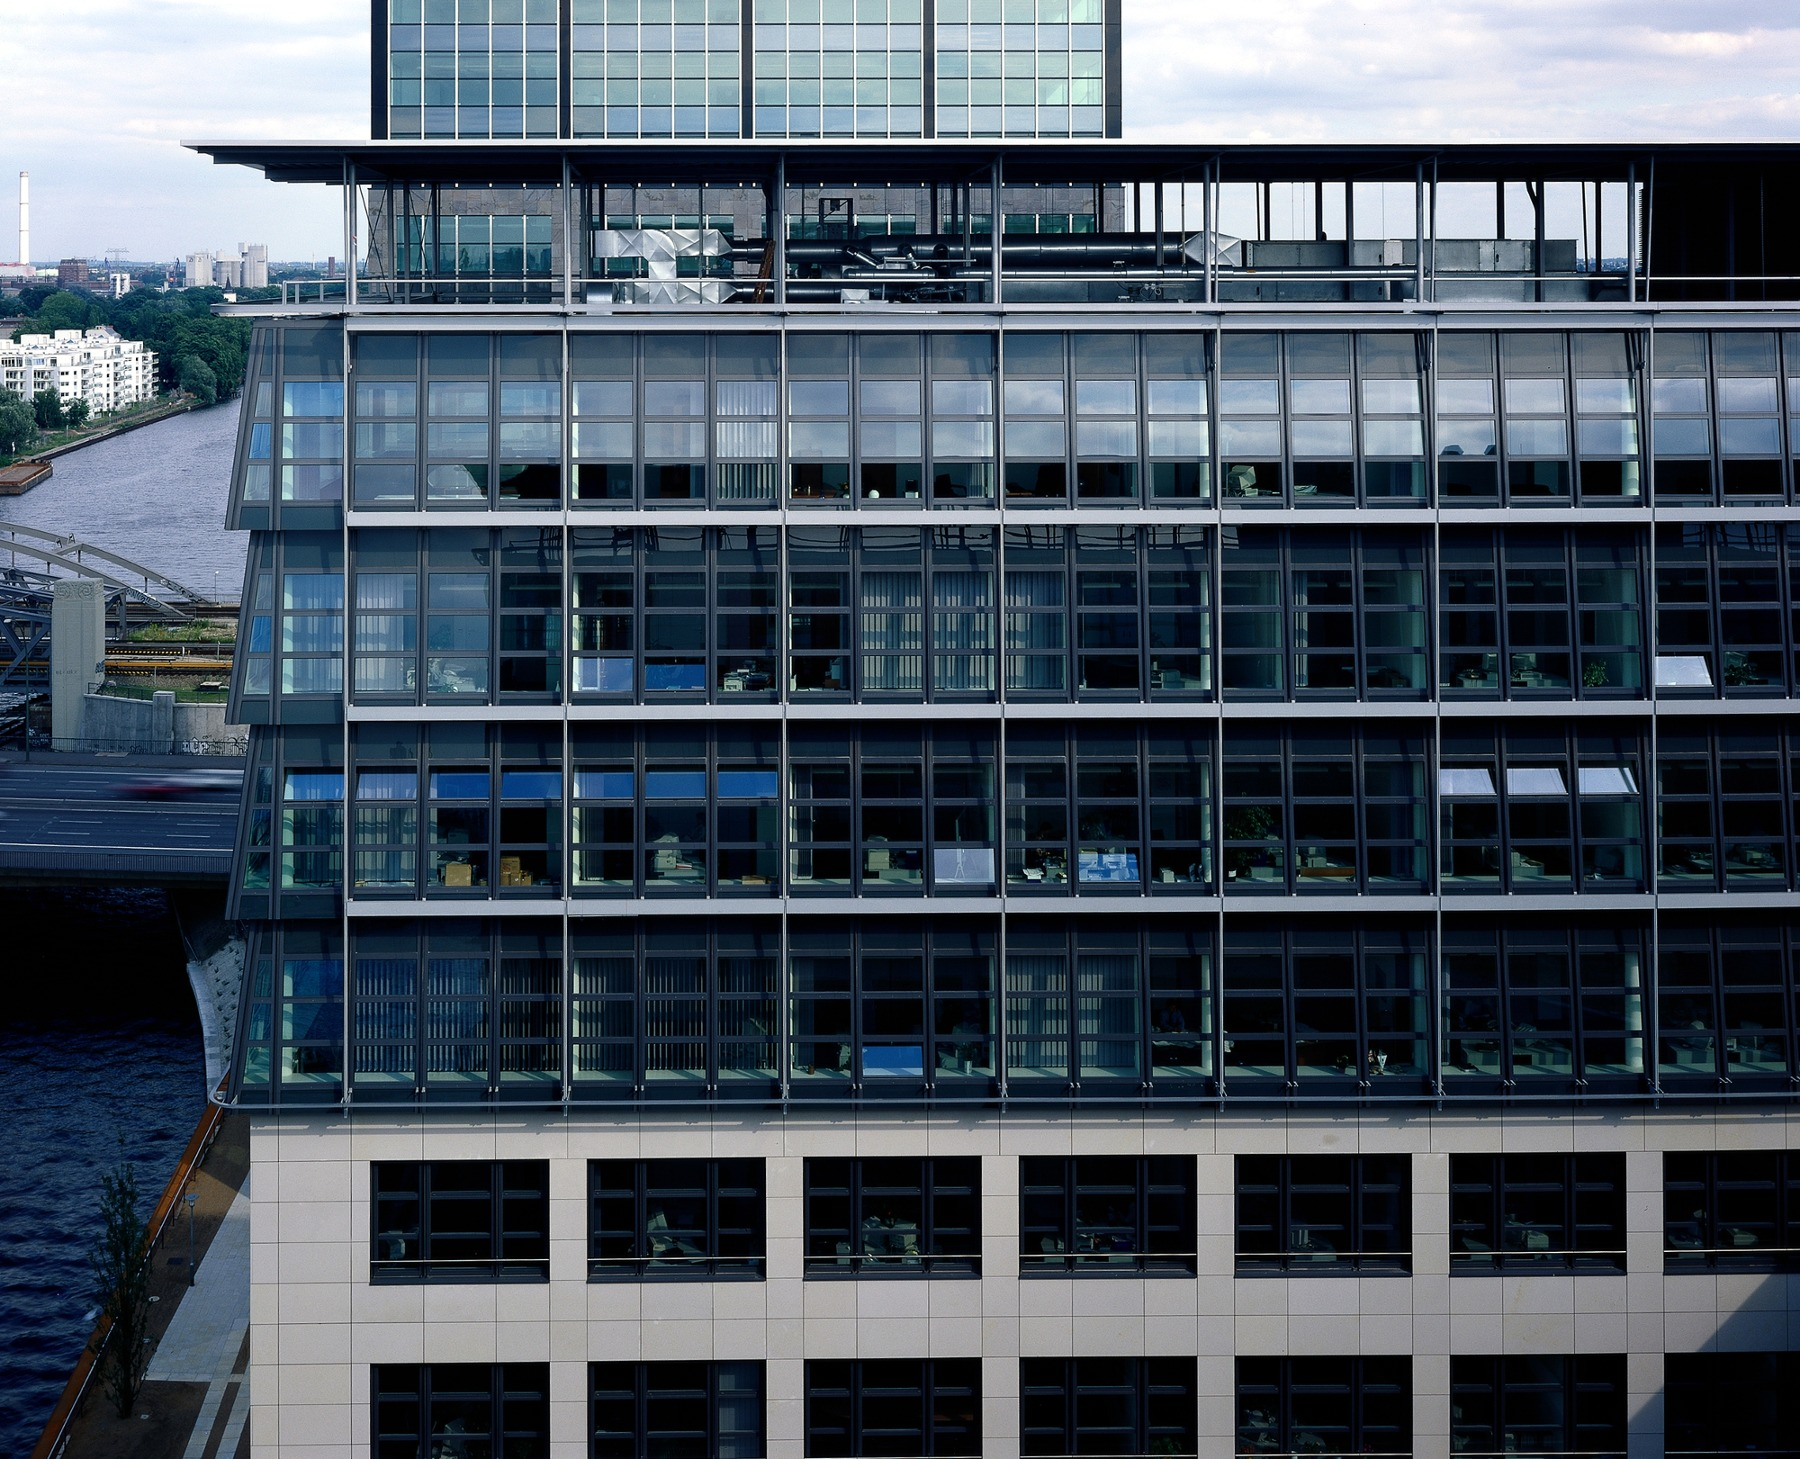 Treptowers Fassadendetail